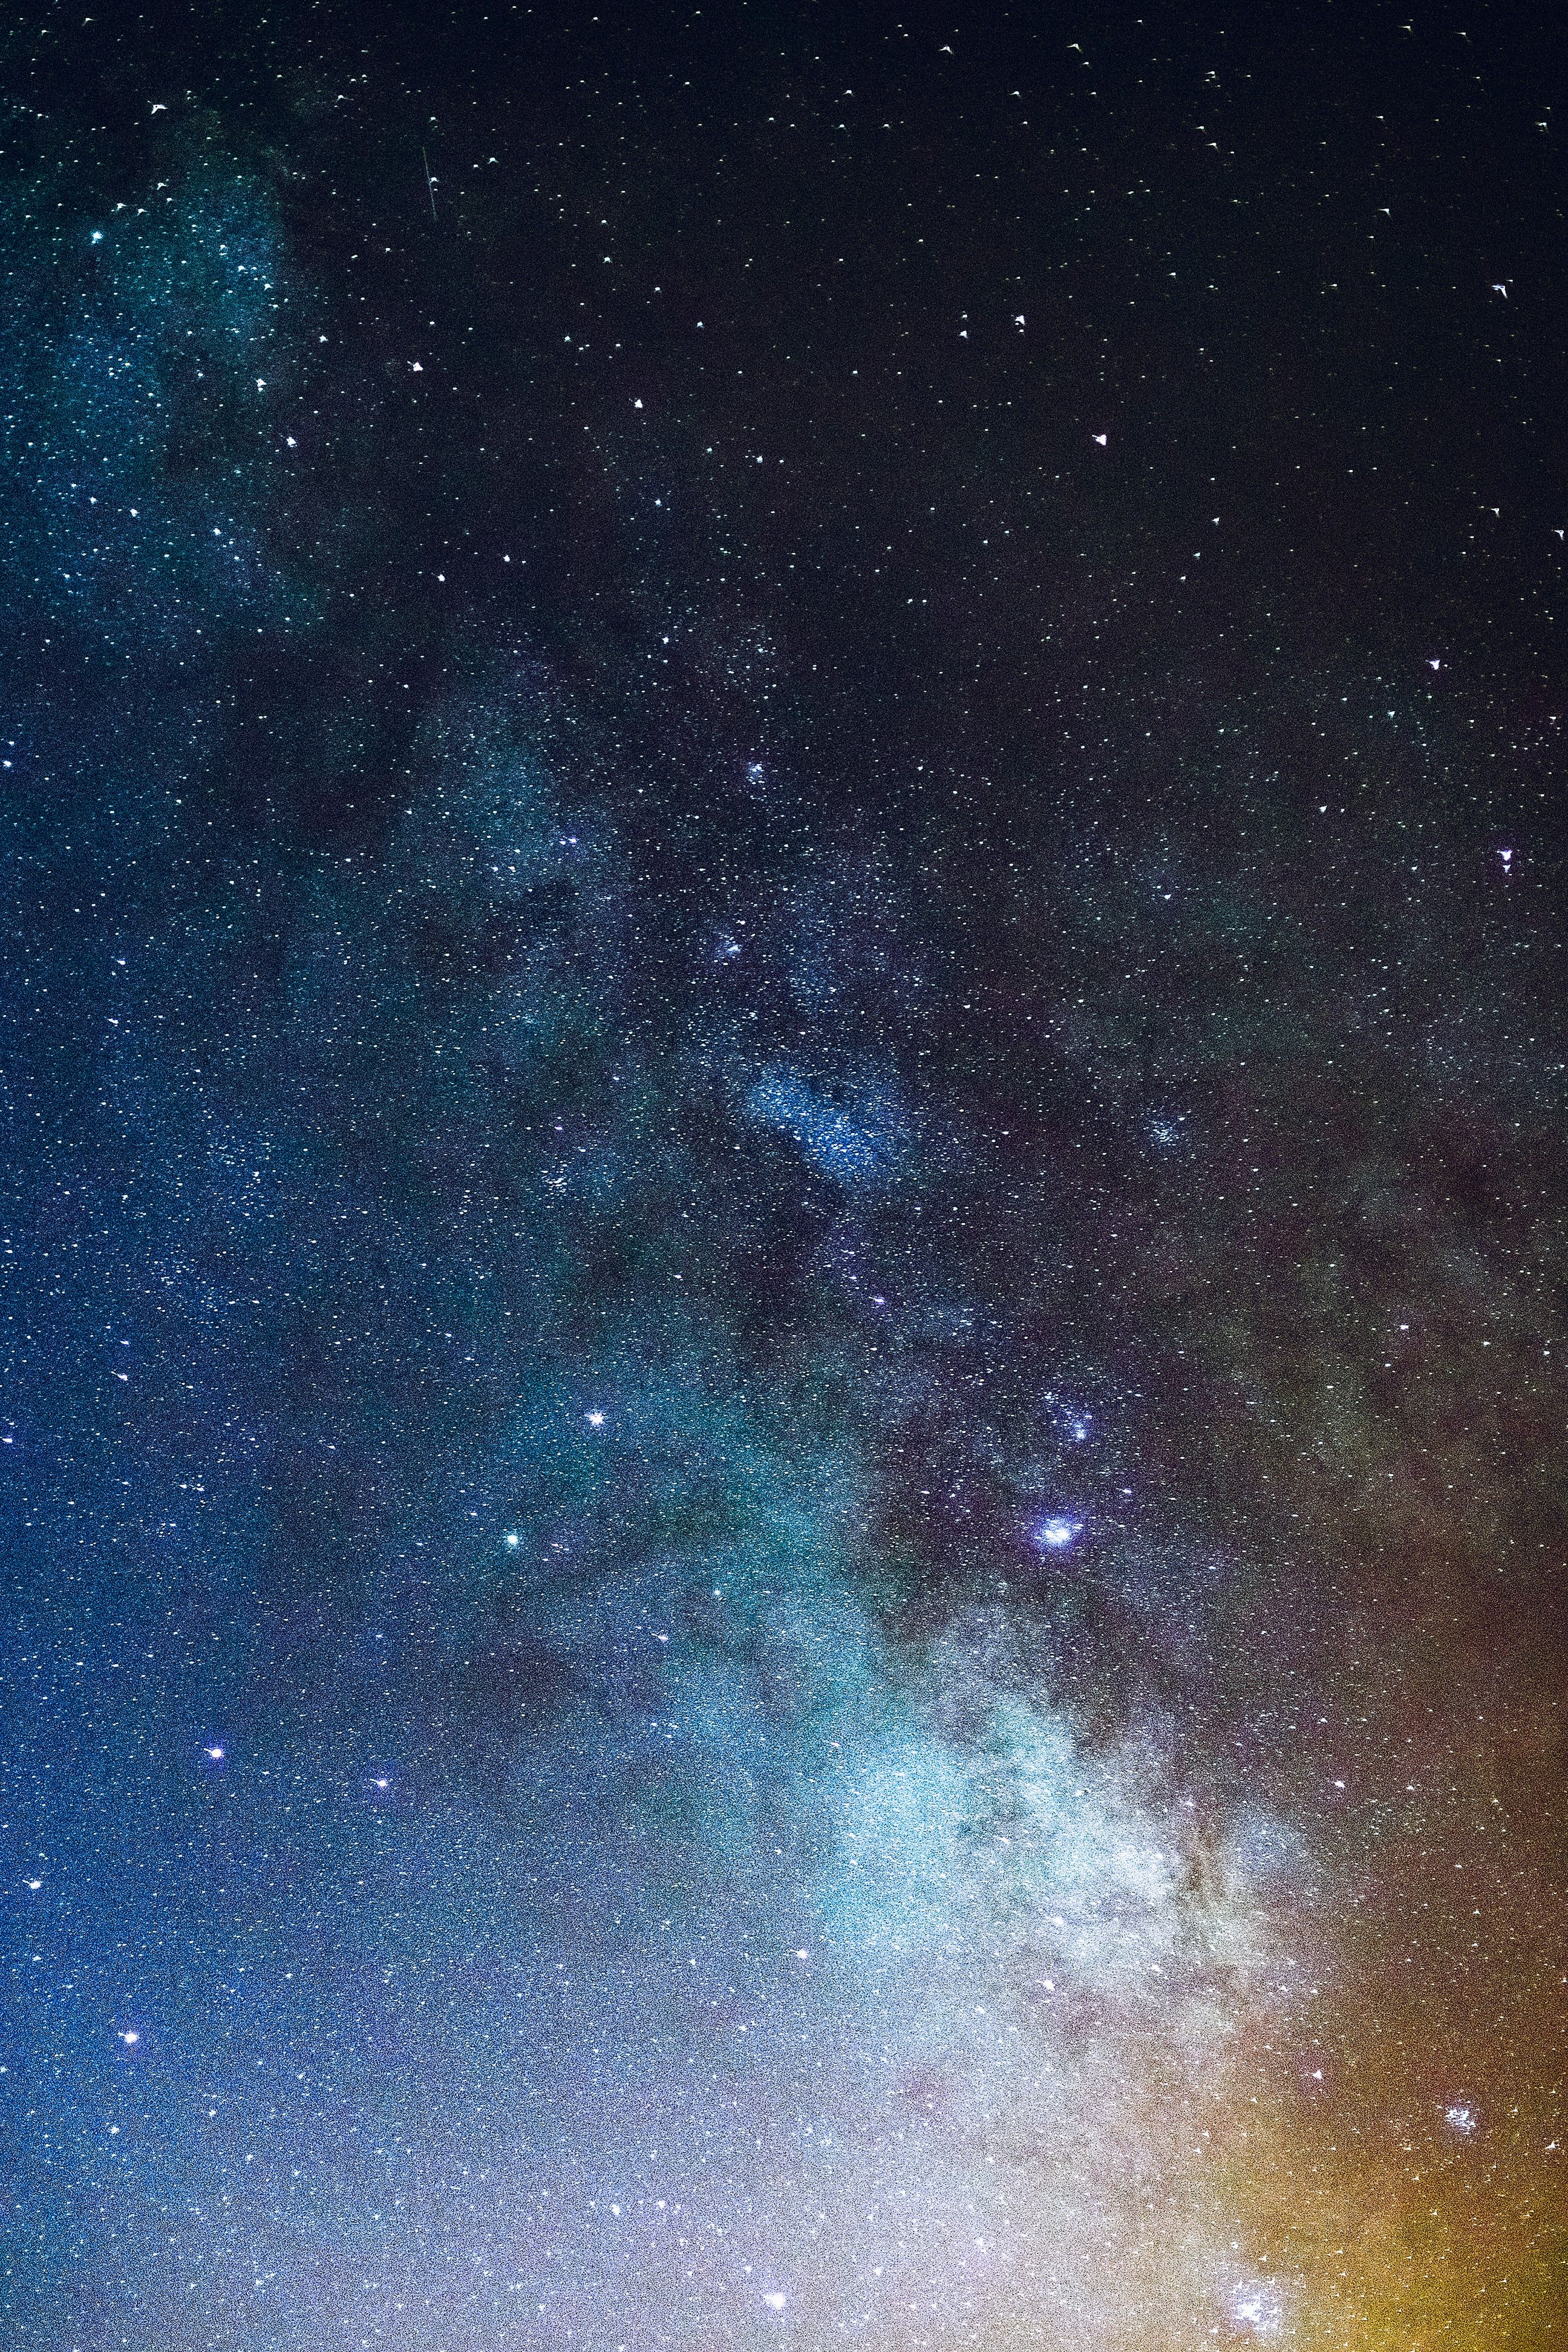 Iphone X Wallpaper Milky way starry sky stars Hd in 2020